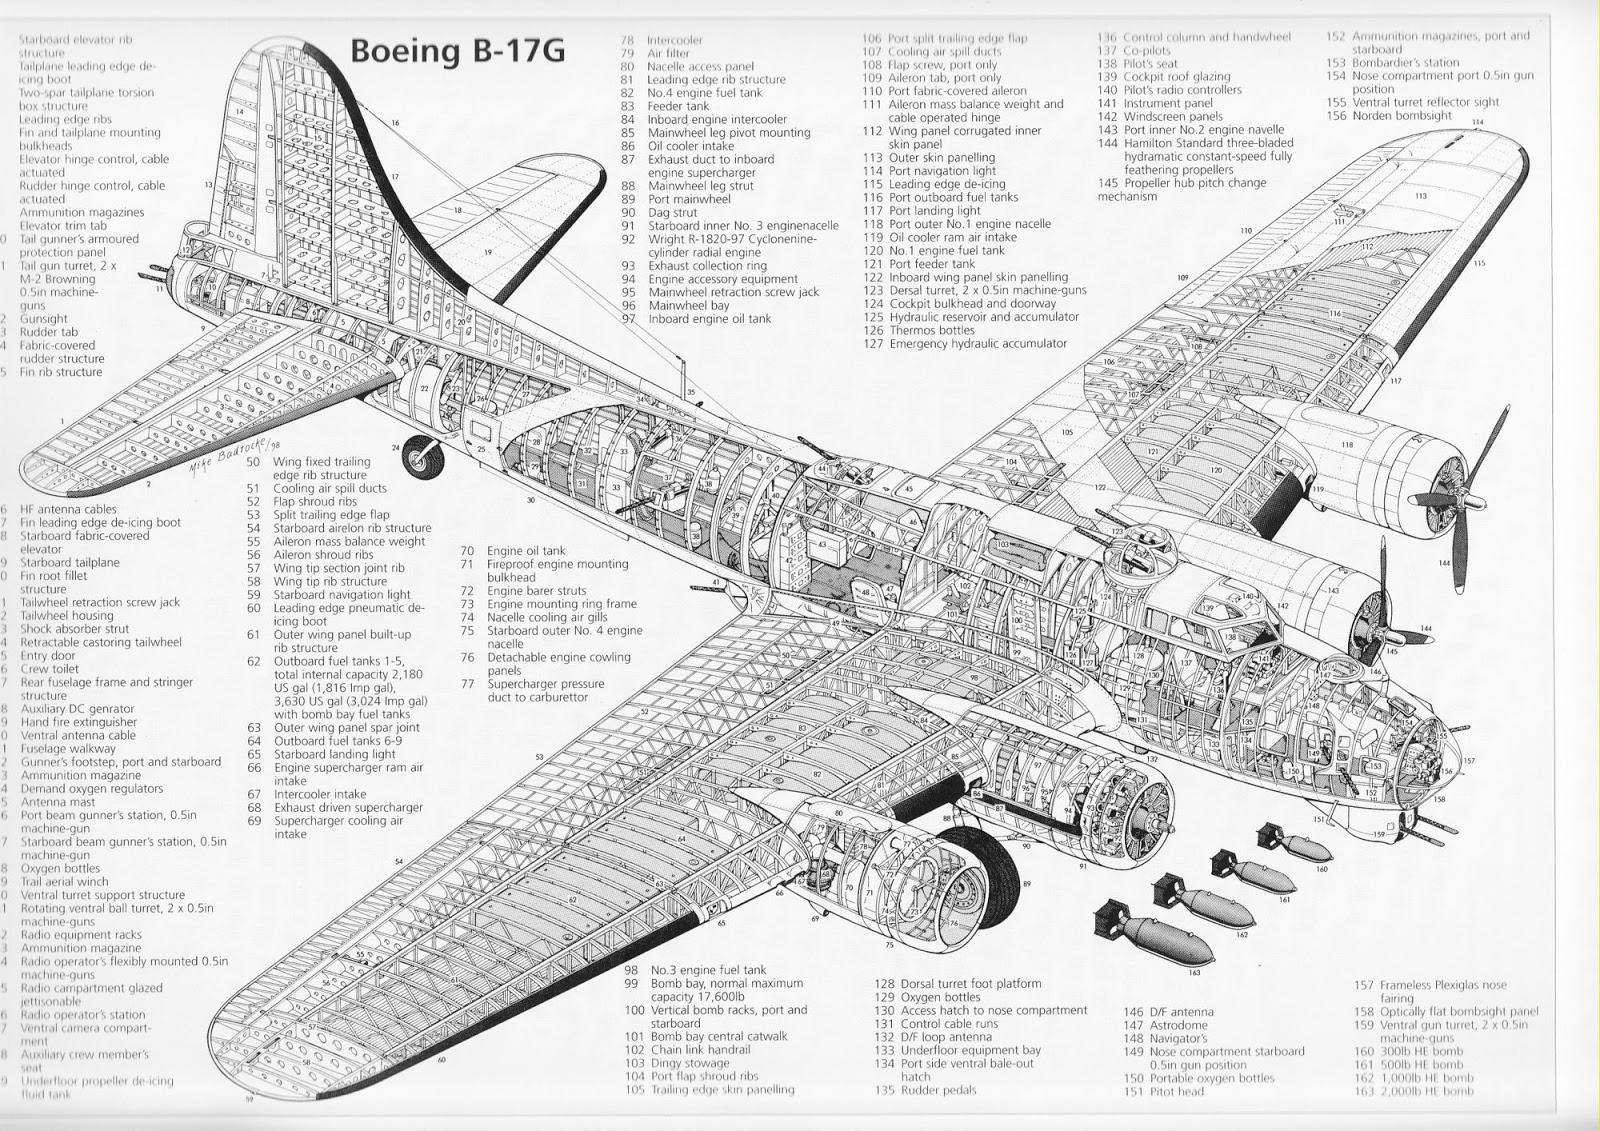 Cut-away view of B-17